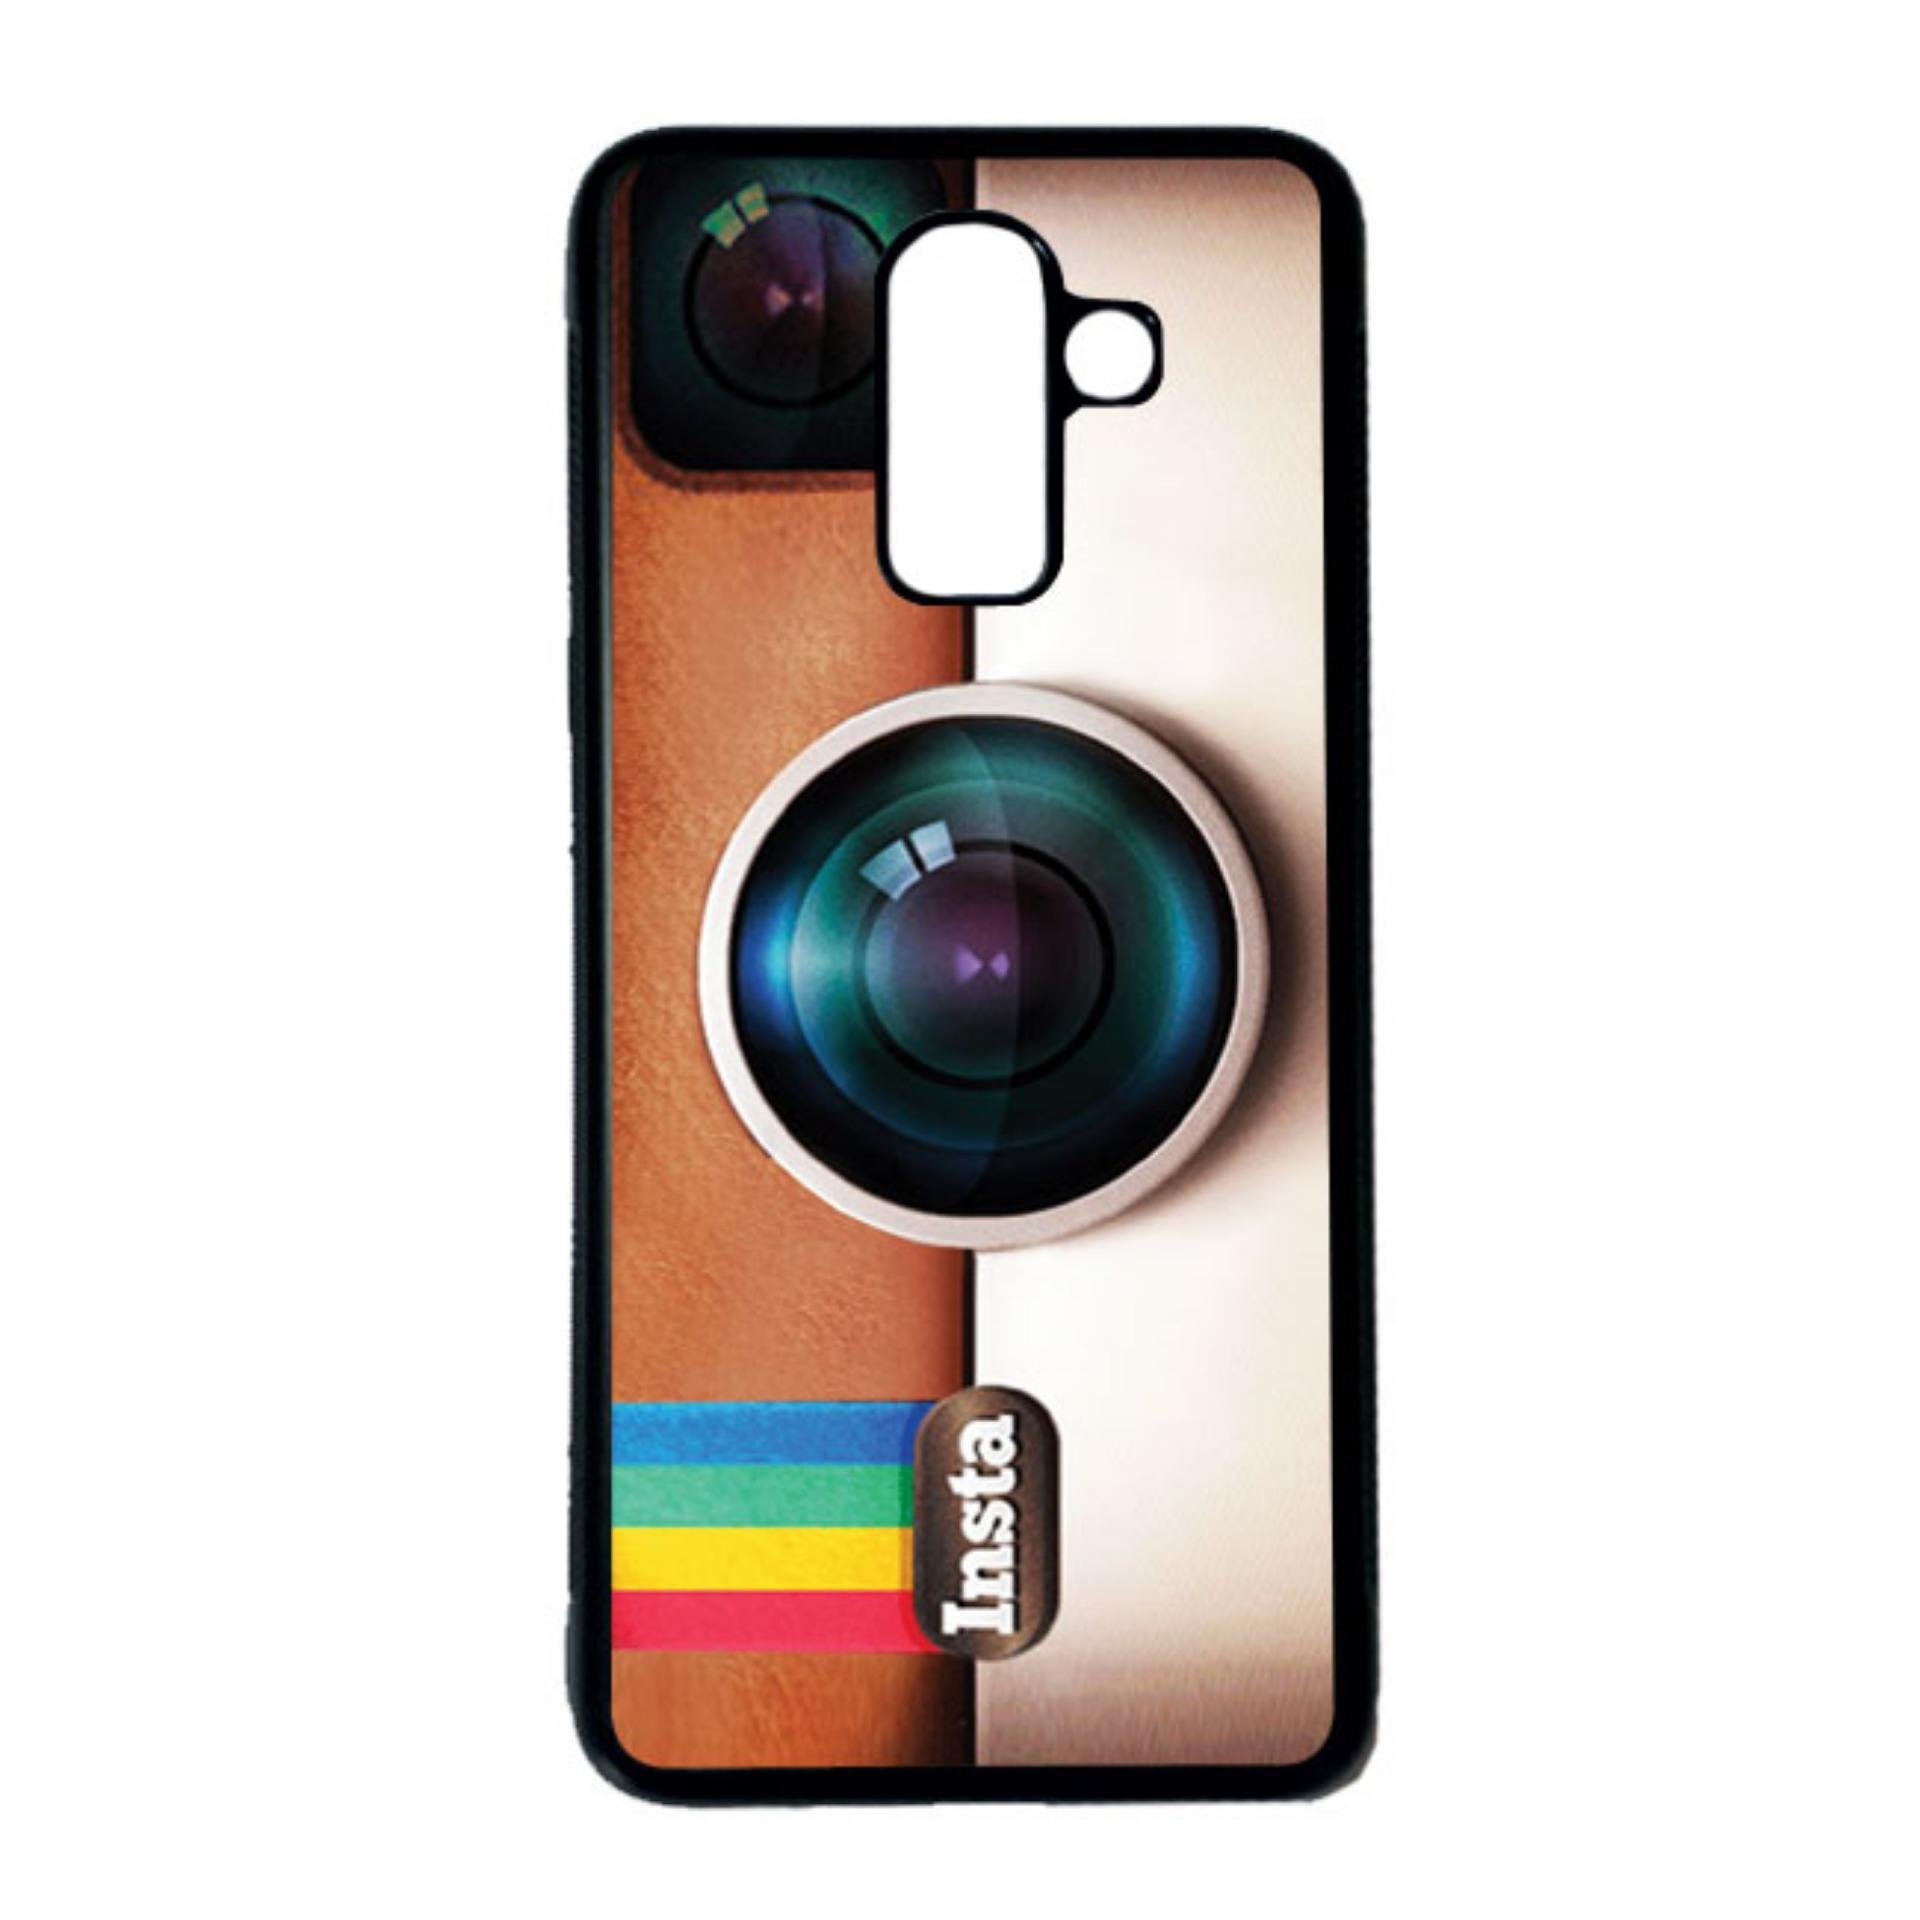 HEAVENCASE Casing Case Samsung Galaxy J8 Case Softcase Hitam Motif Unik Instagram